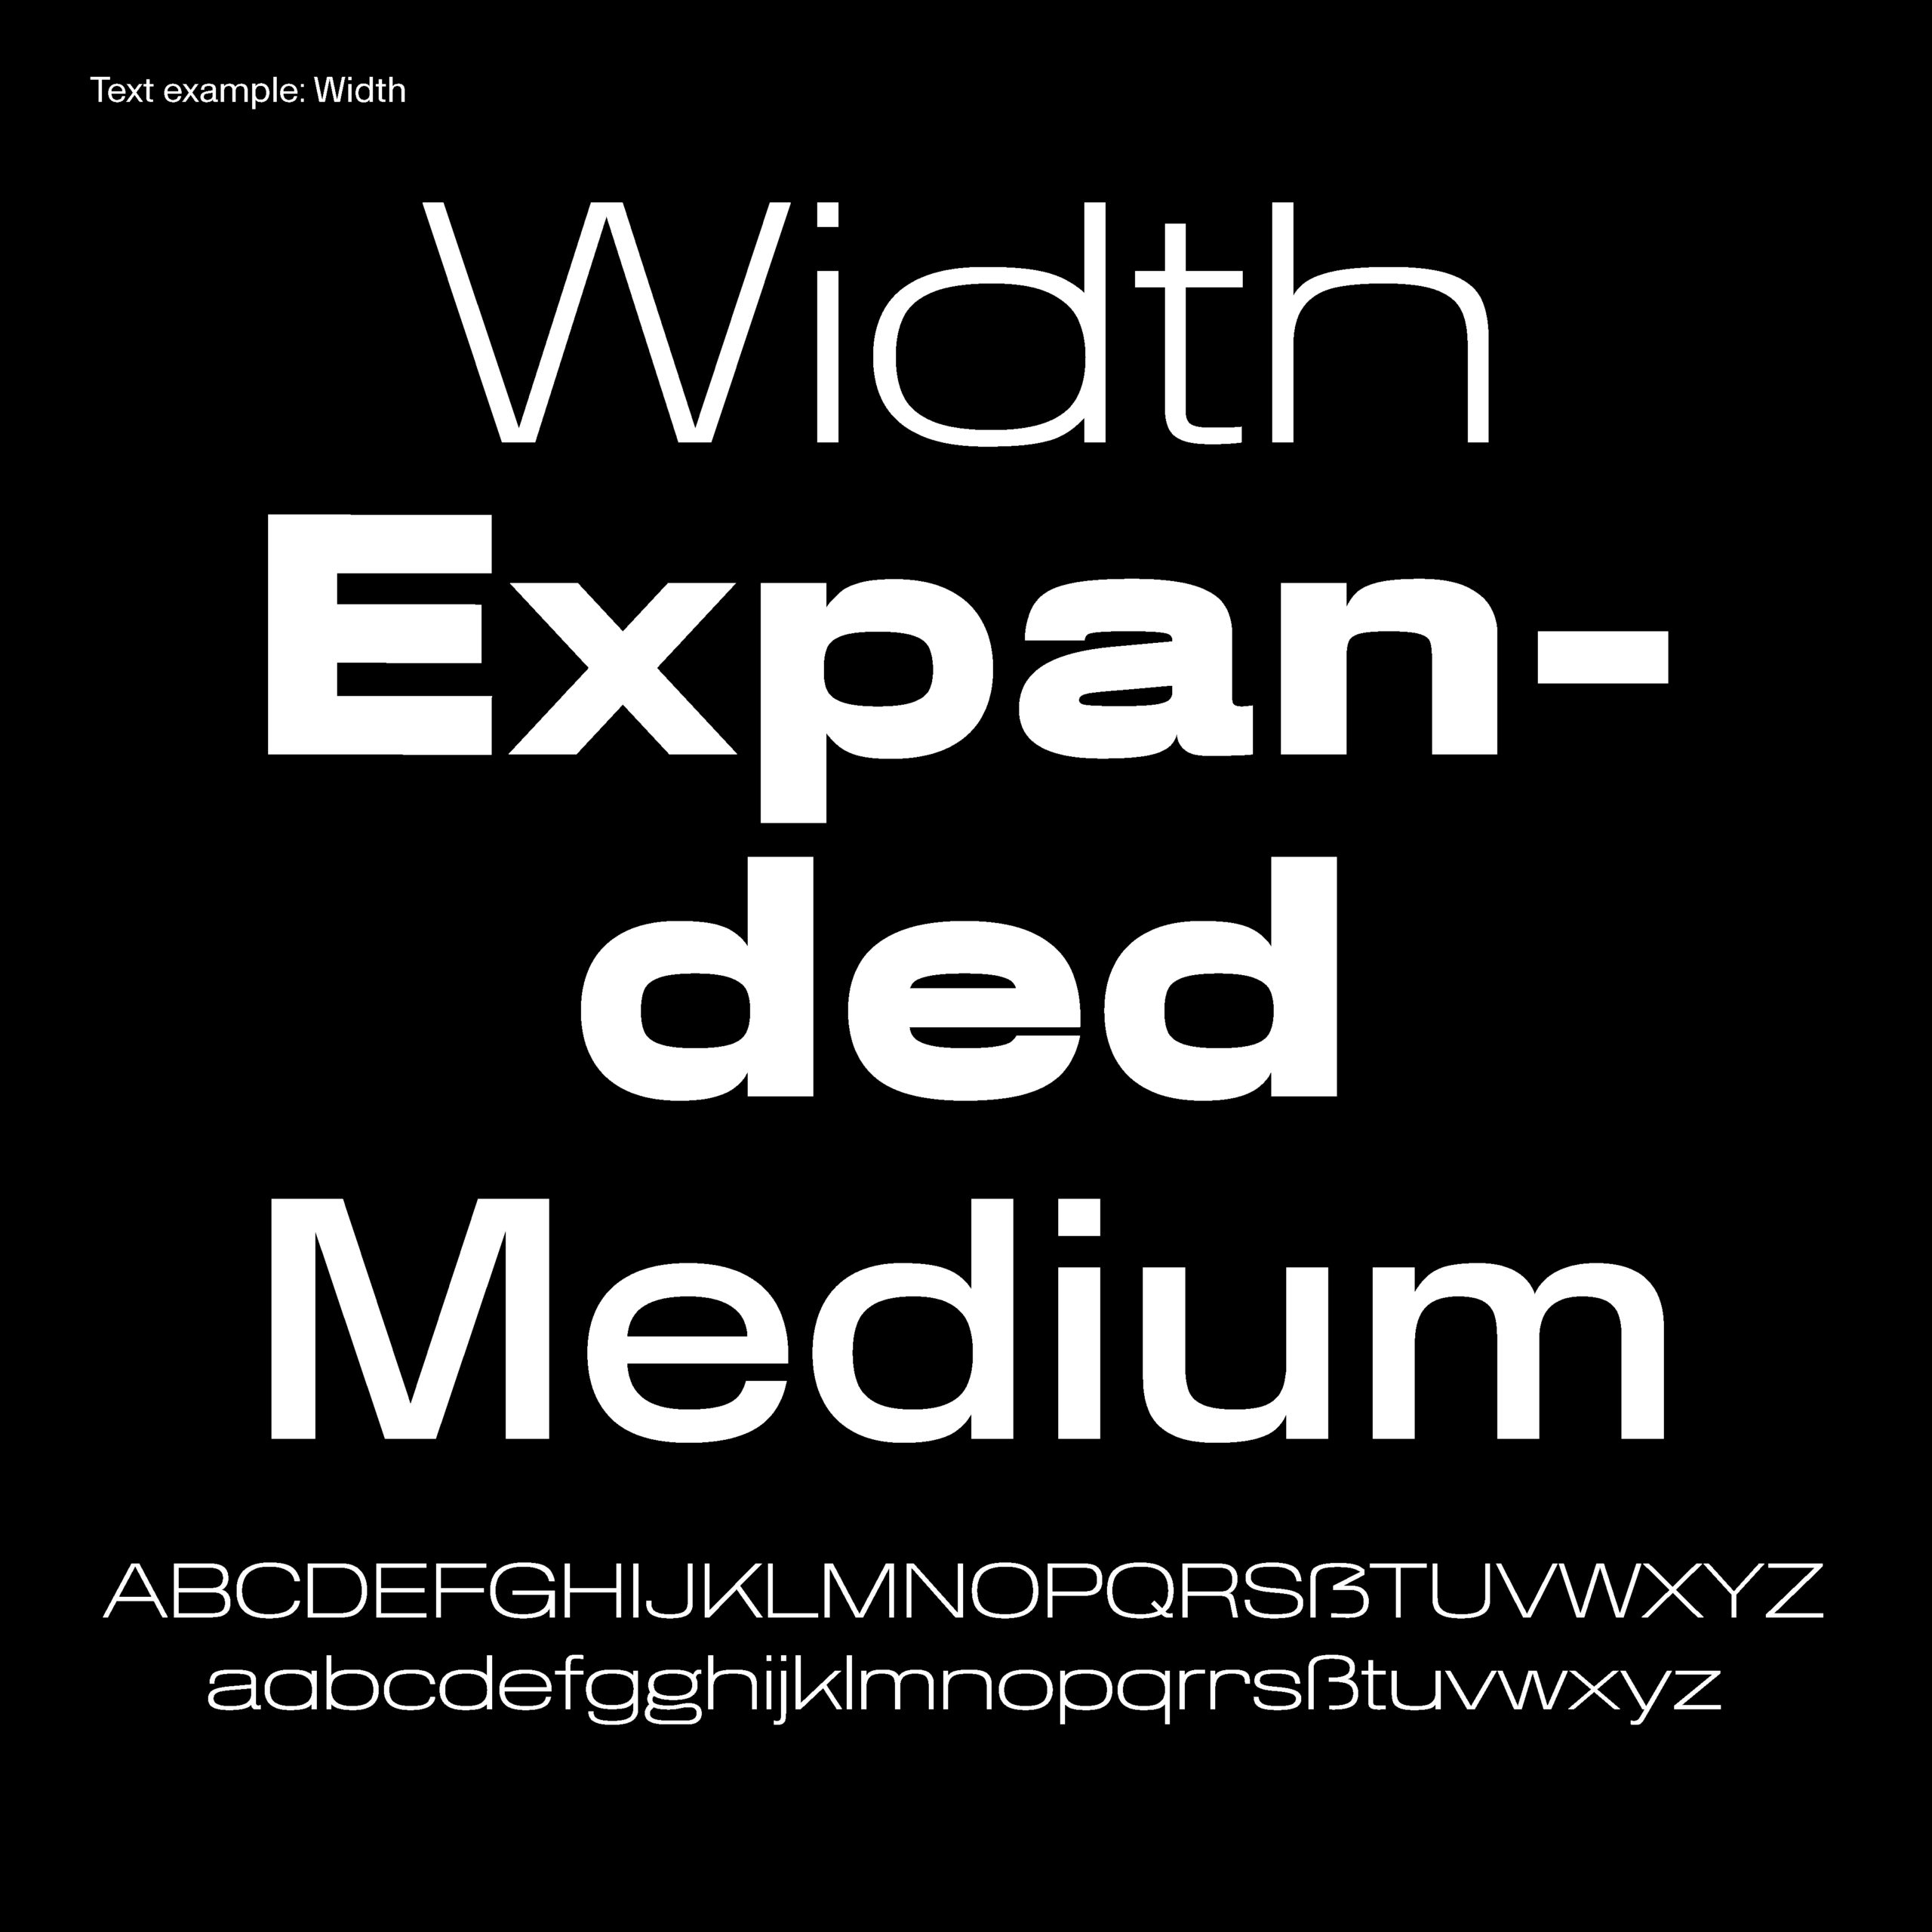 Daniel_Stuhlpfarrer_Spekulative-Schriftgestaltung-Speculative-Type-Design_WEB-new24